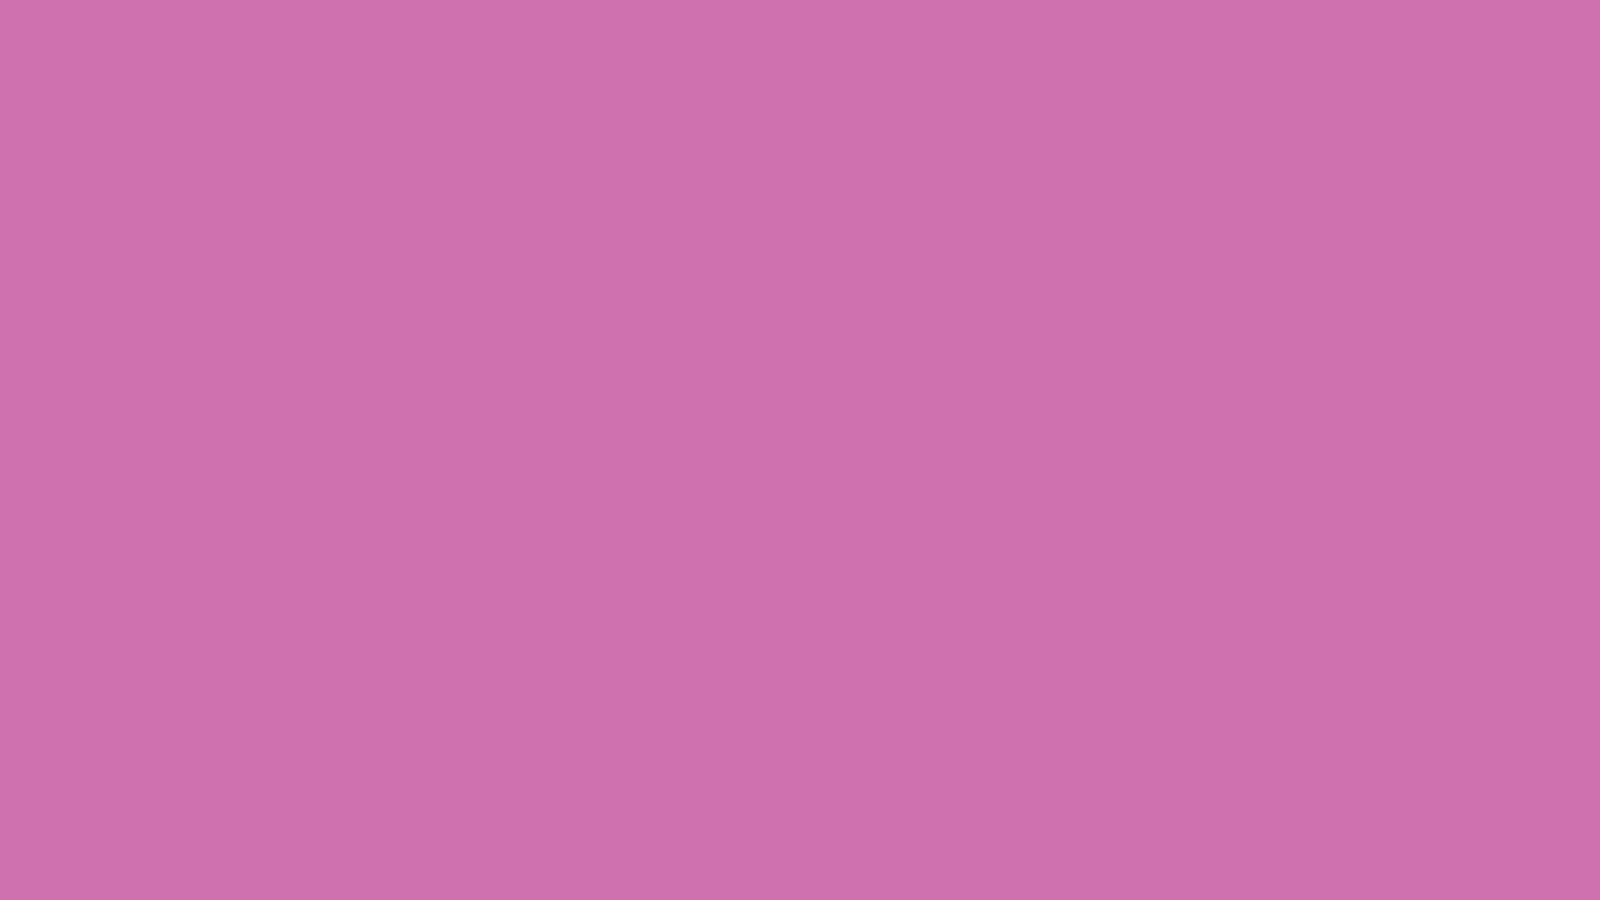 1600x900 Sky Magenta Solid Color Background